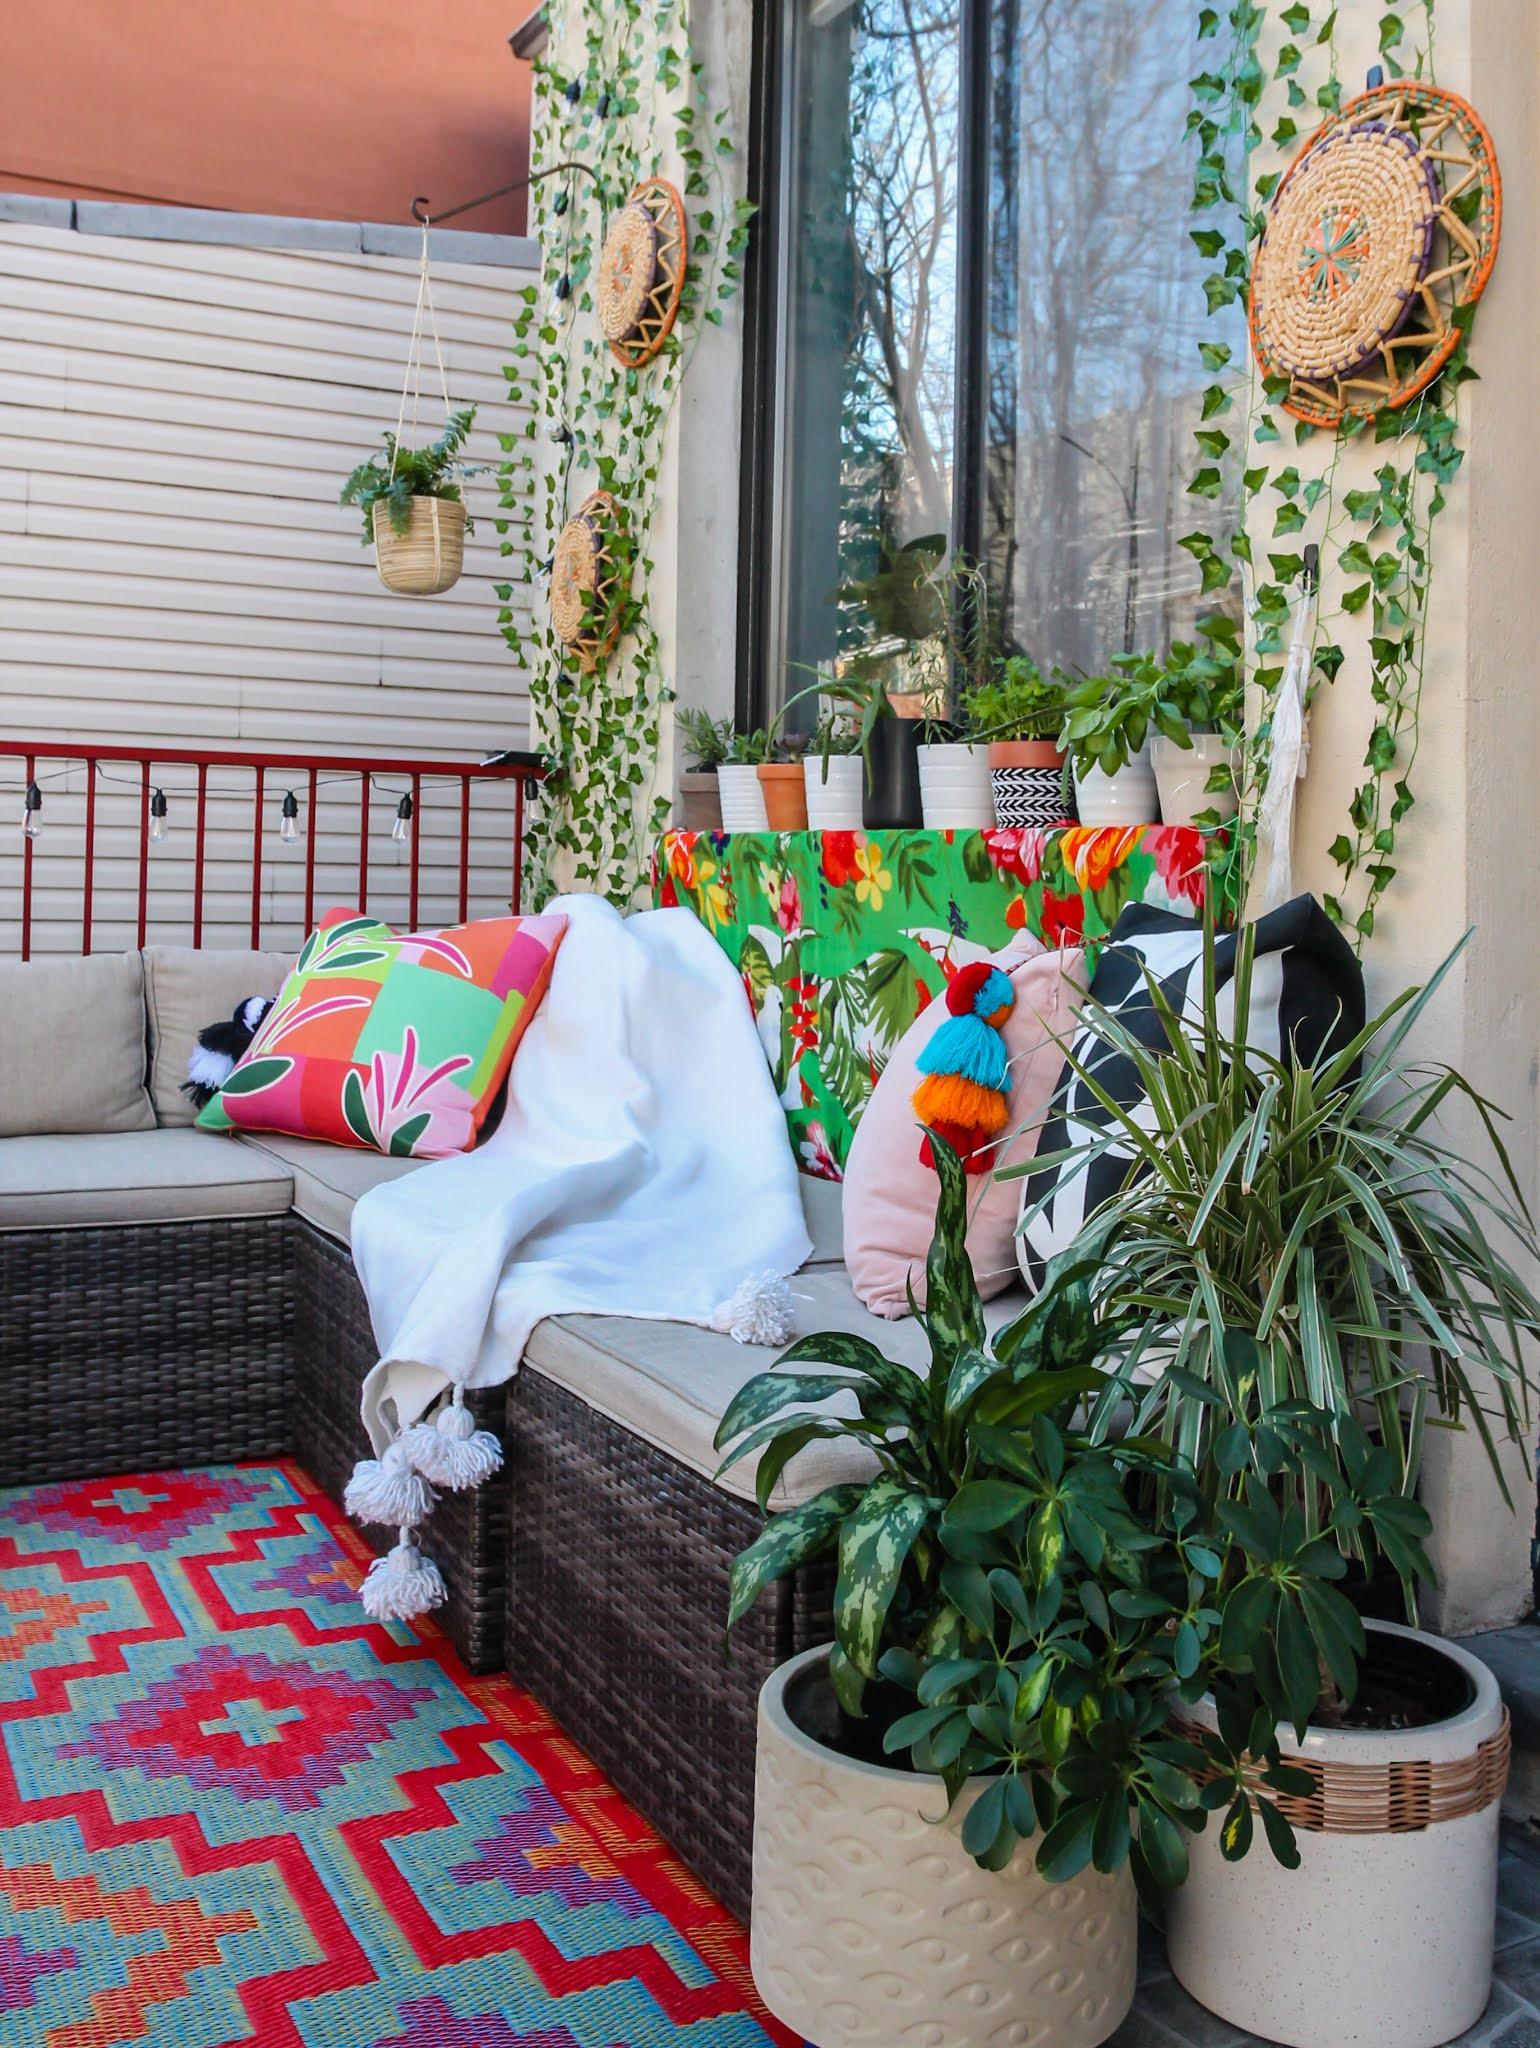 Renter-Friendly Patio Decor,  patio decor, faux ivy wall, command outdoor light clips, patio decor ideas, faux ivy wall diy, small space patio decor, small patio design ideas, easy faux ivy wall with fairy lights